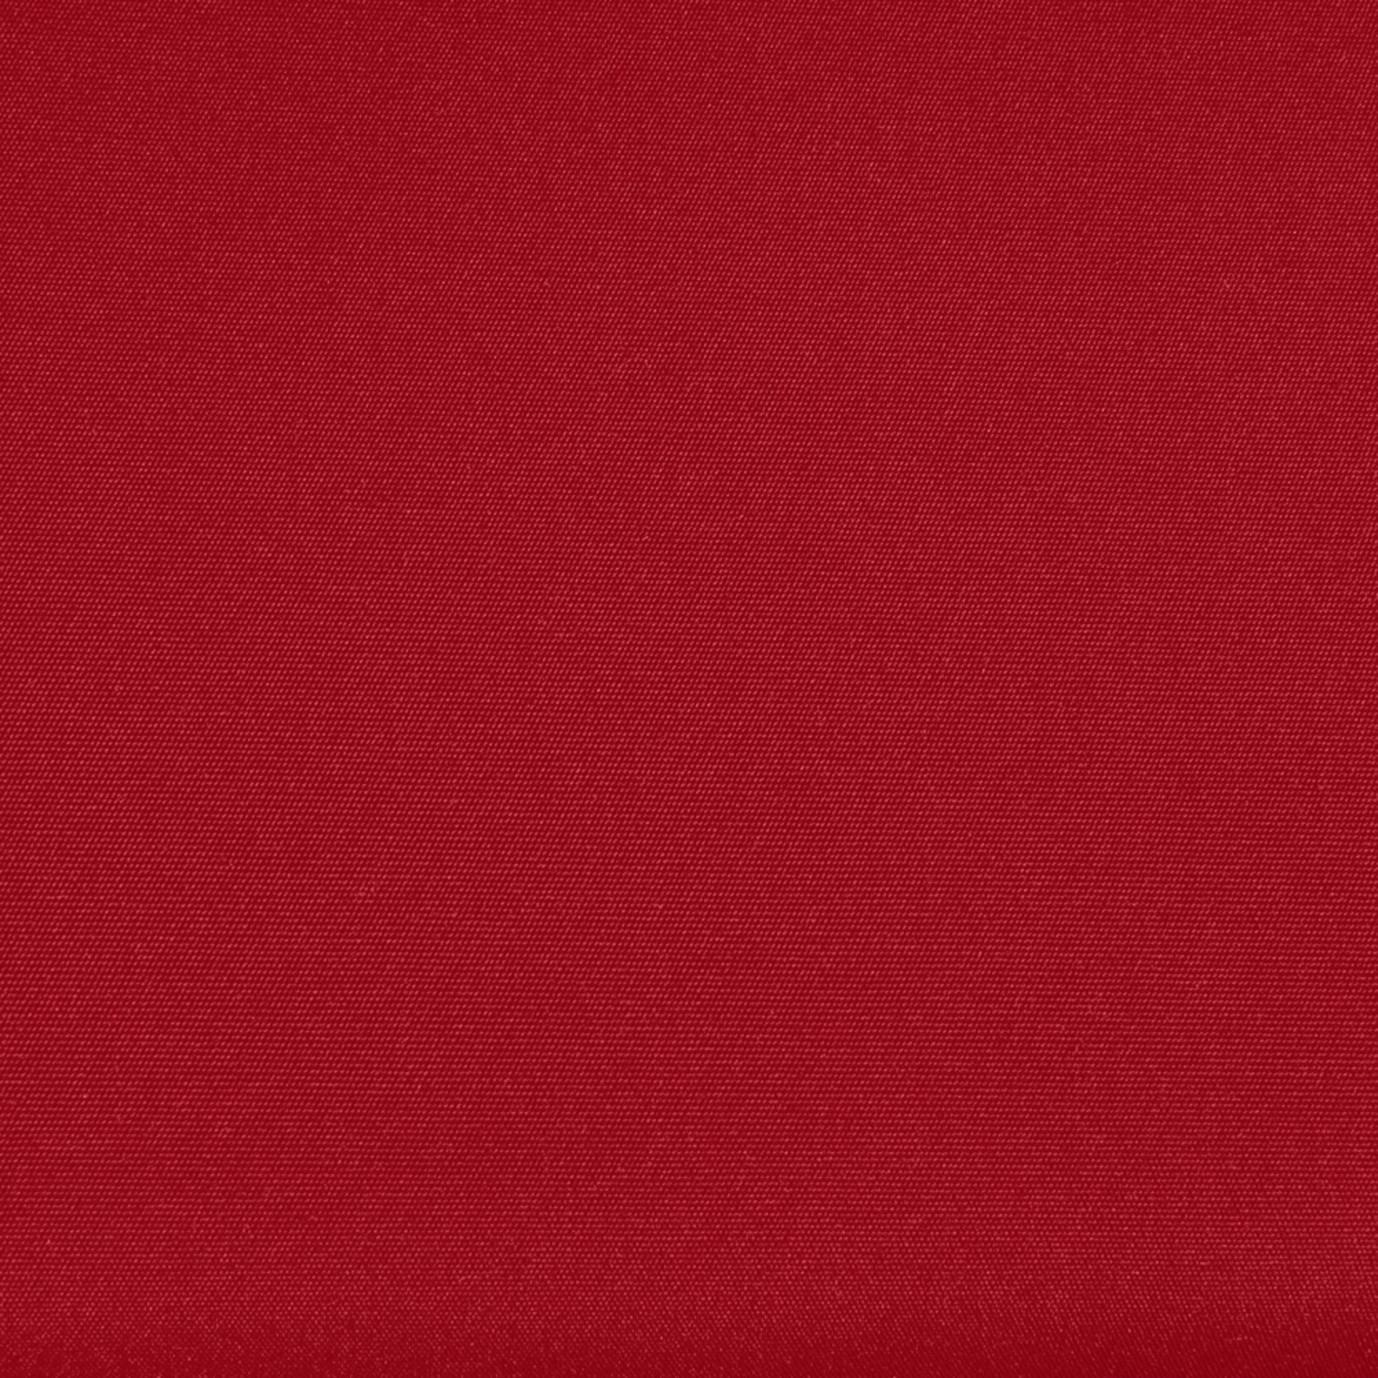 Milo™ Espresso Ottomans - Sunset Red